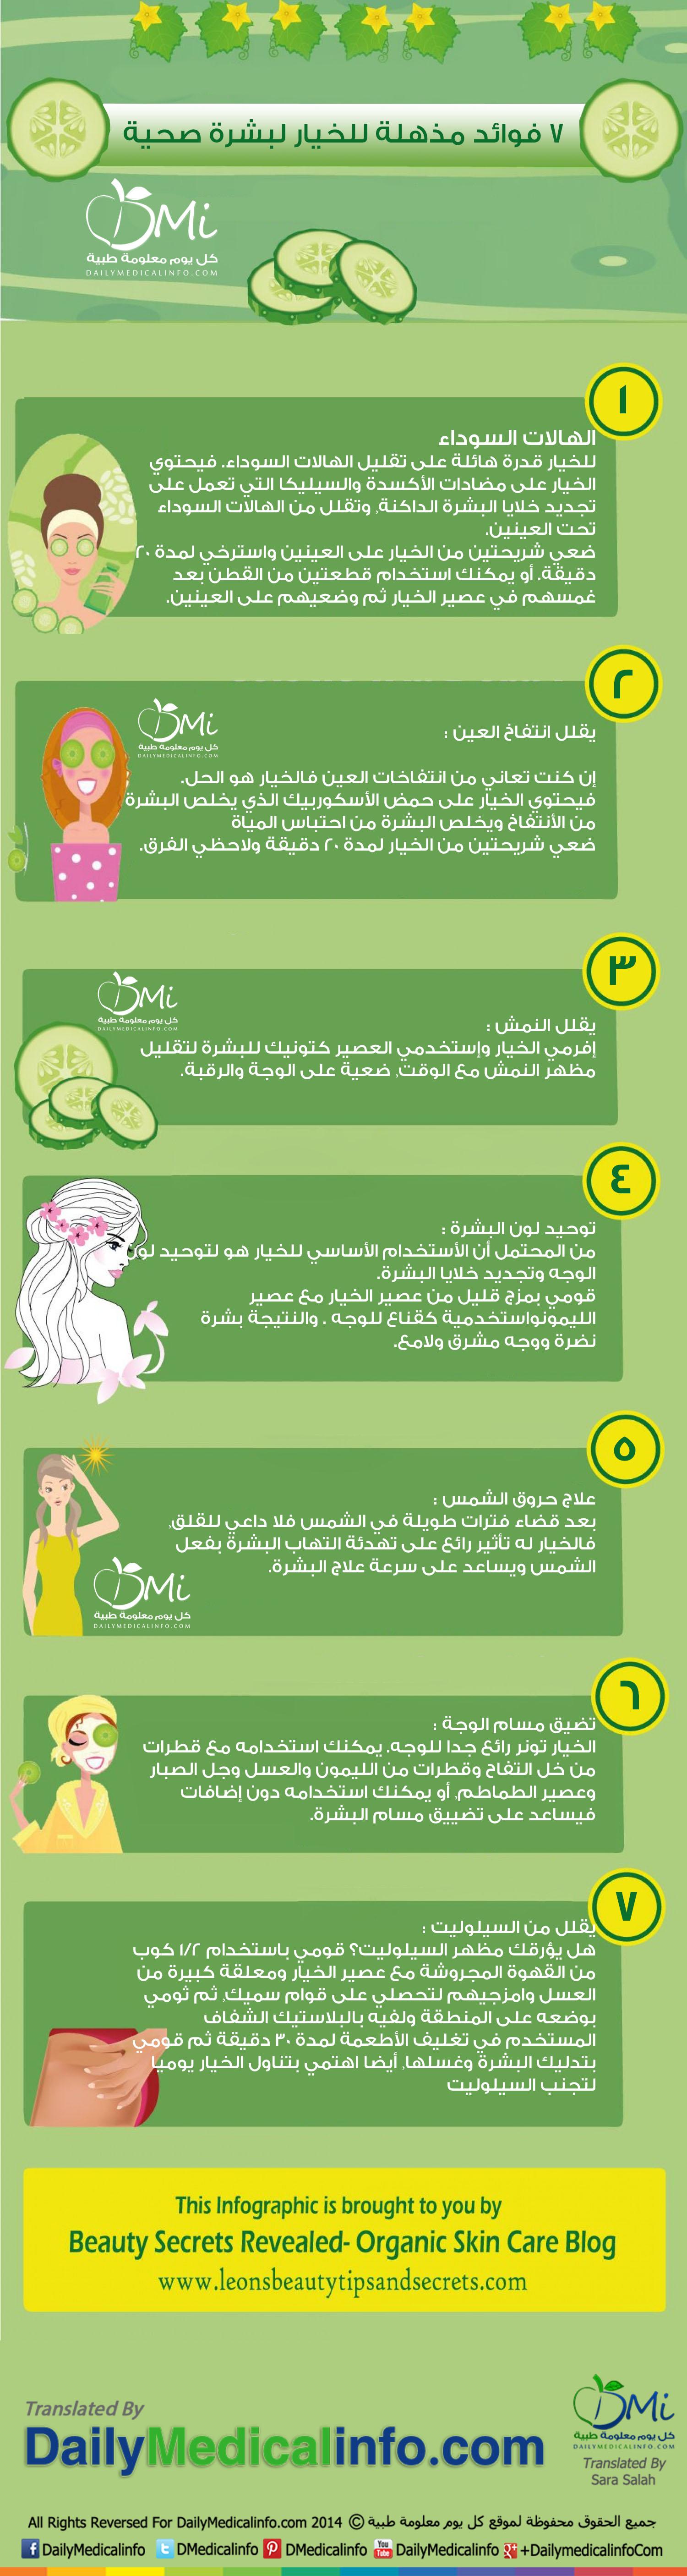 7 wonderful benefits of cucumber for healthy skin 521202ead757e w1500